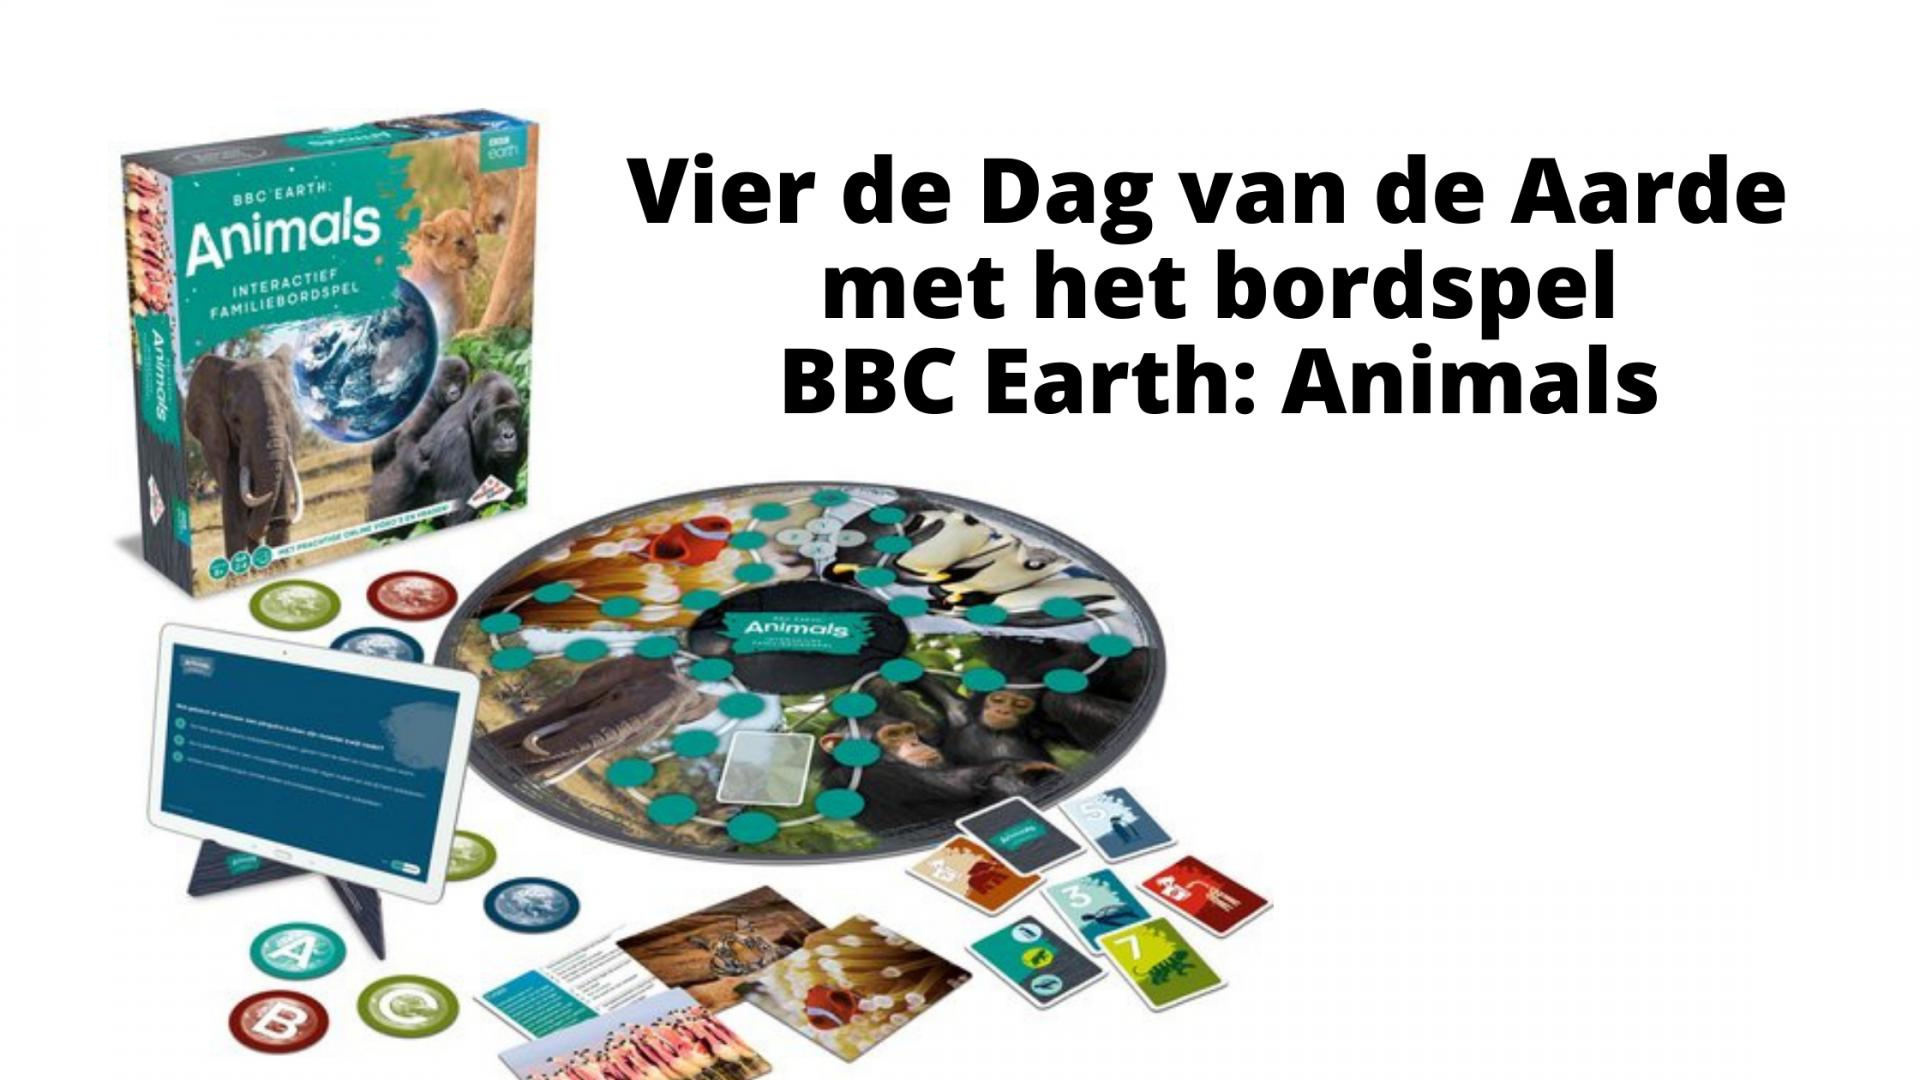 BBC Earth: Animals